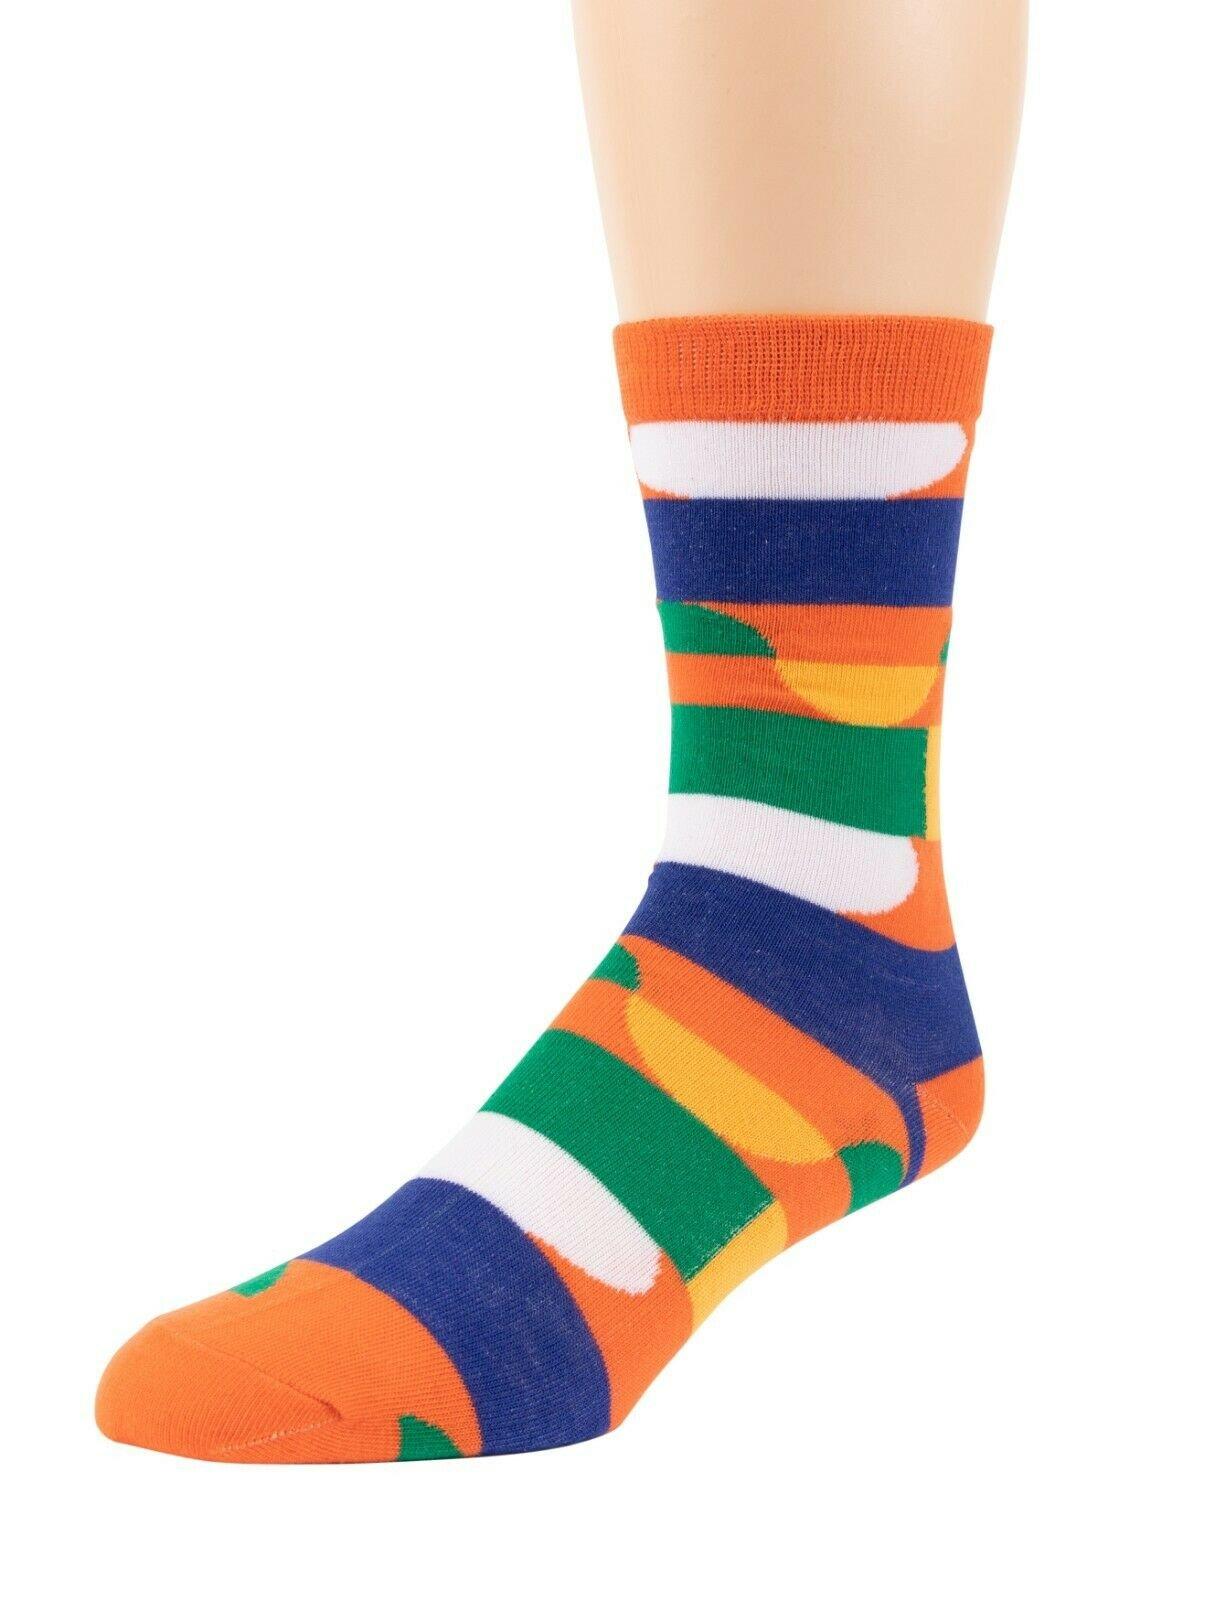 Mitch-Bogen-Mens-Cotton-Dress-Socks-Colorful-Fashion-Crew-Socks-8-Pack-Gift-Box thumbnail 21